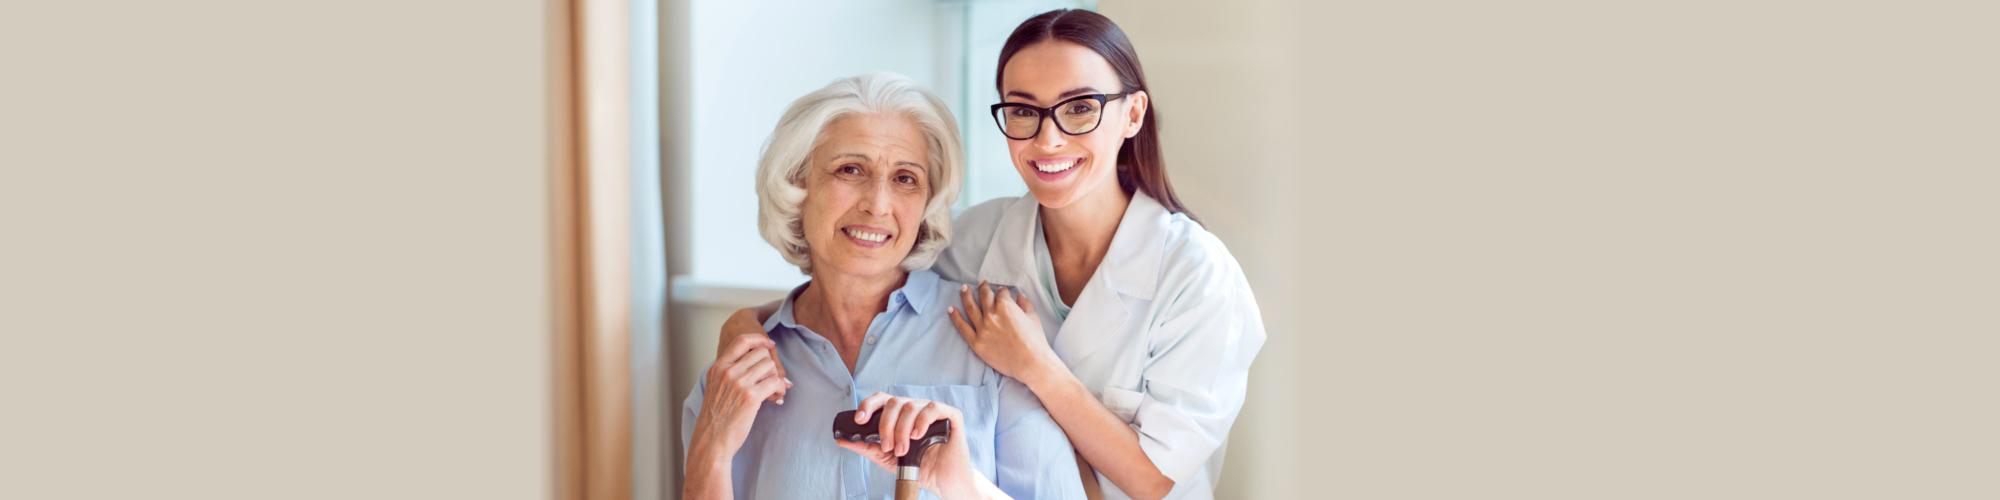 senior woman and a caregiver smiling